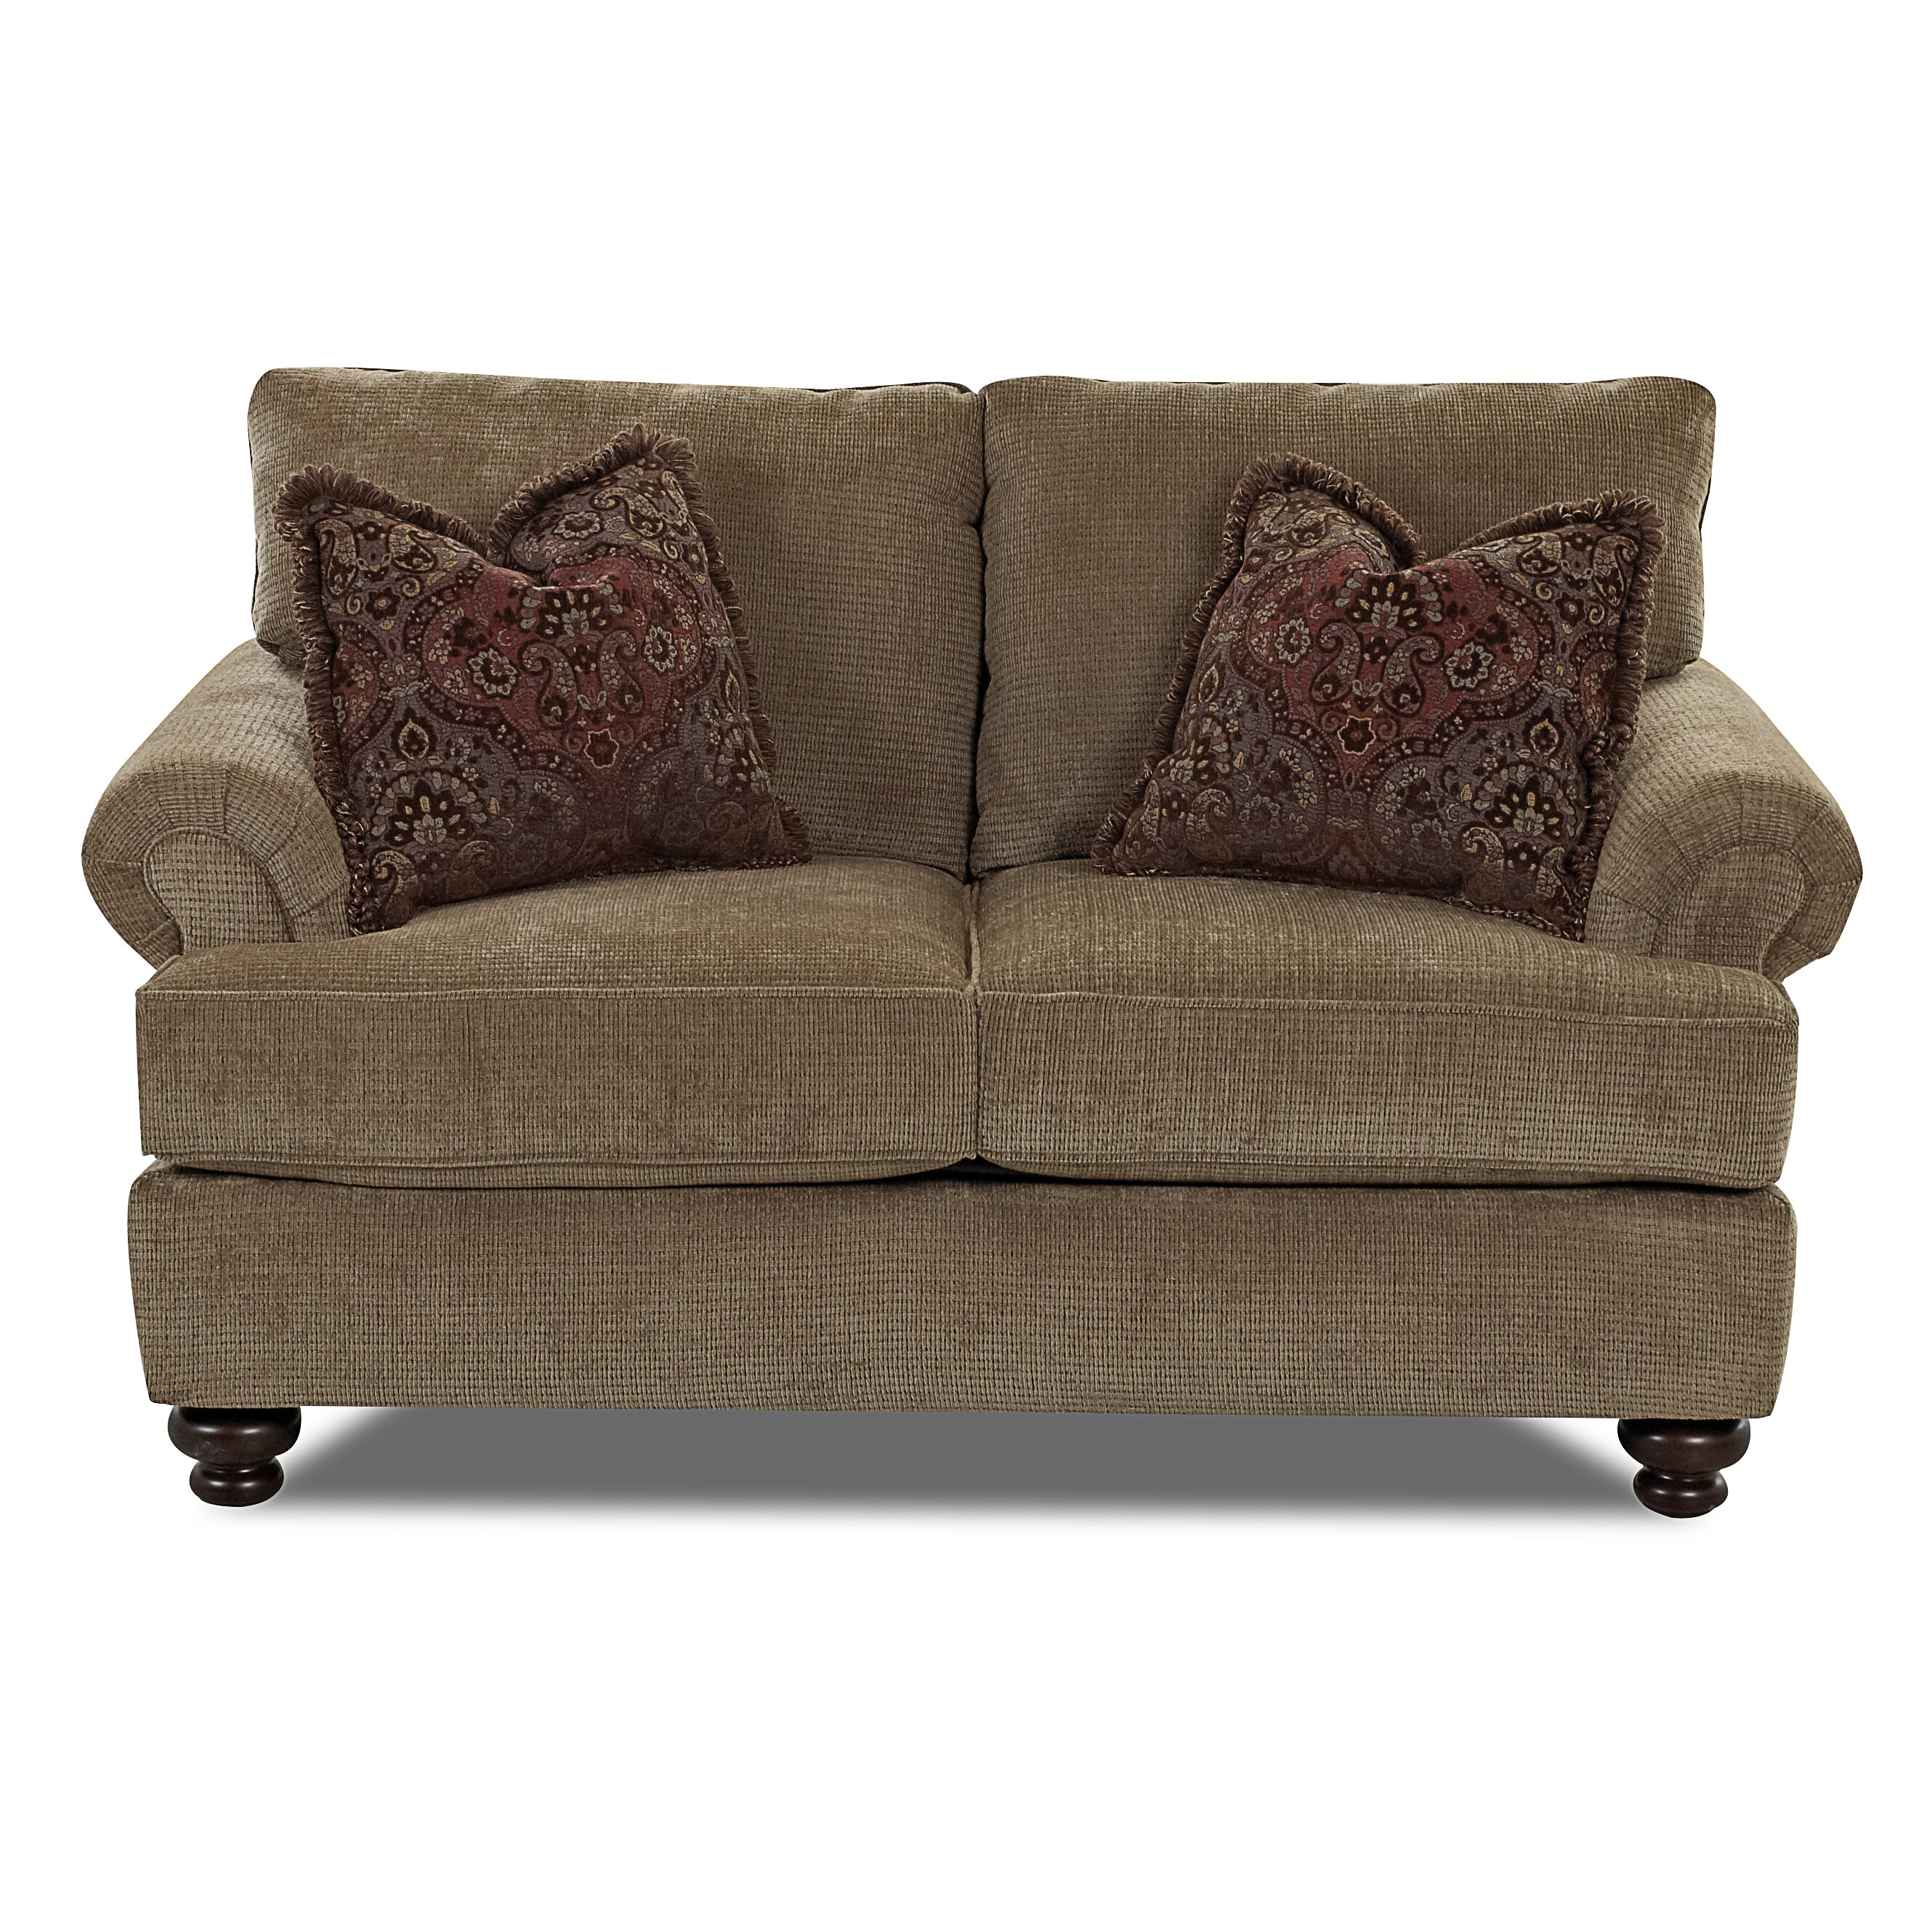 Klaussner Bedroom Furniture Klaussner Furniture Cross Loveseat Reviews Wayfair